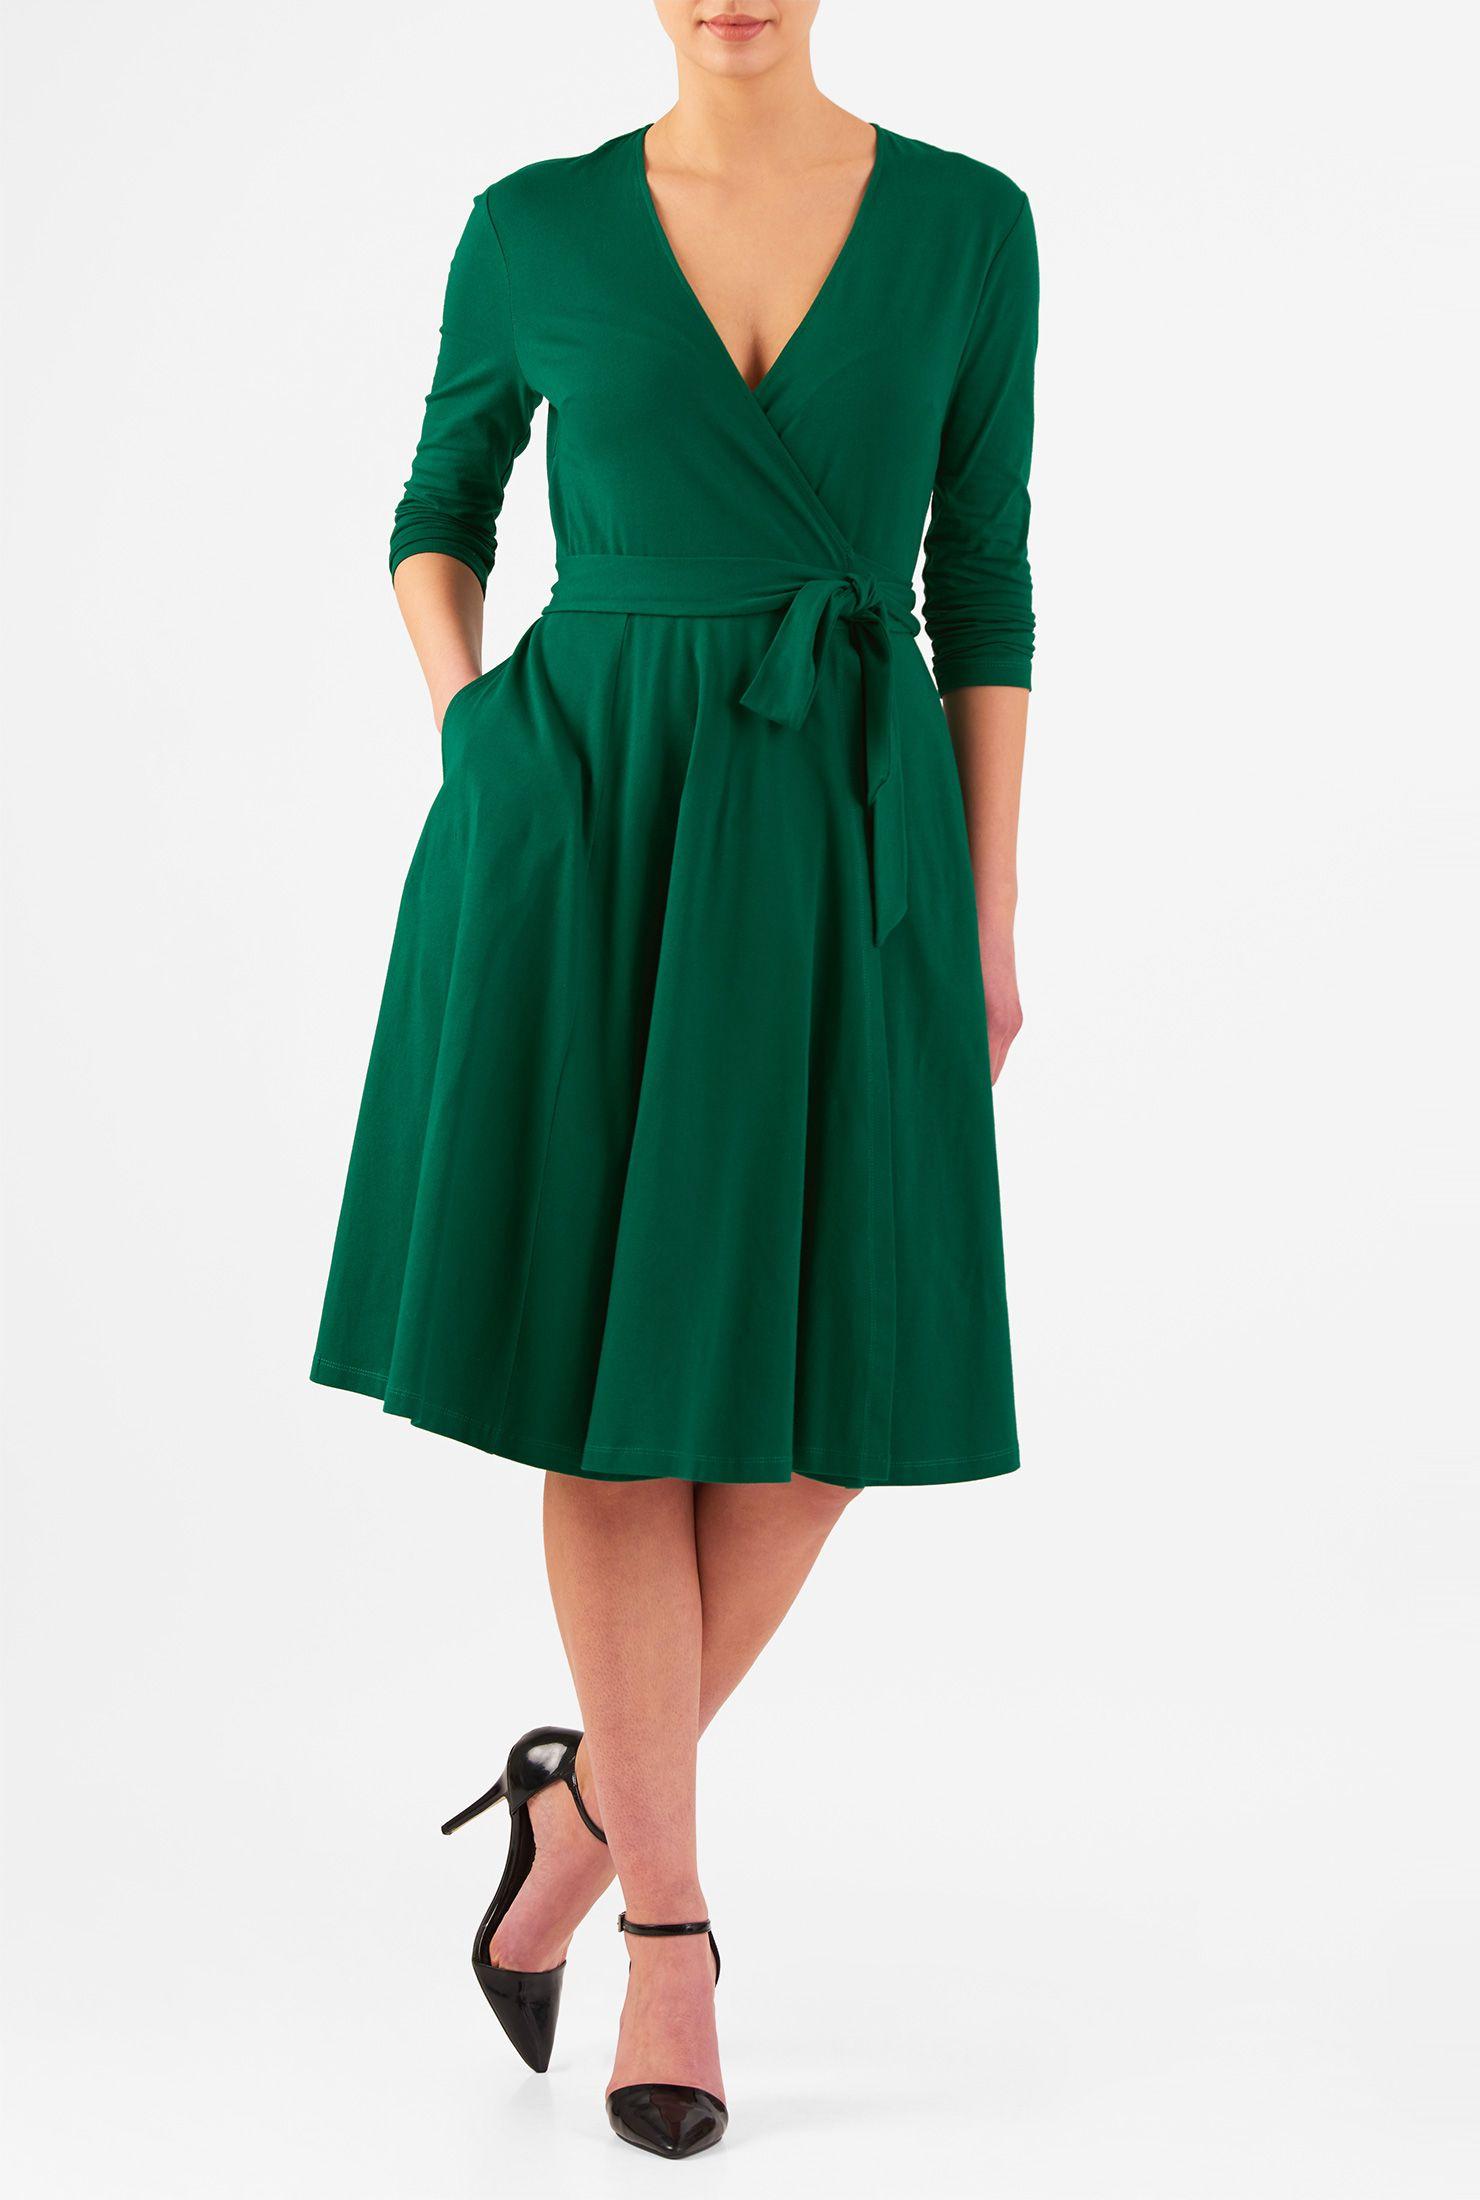 Green dress v neck  Vneck cotton knit wrap dress  Day dresses Knee length dresses and